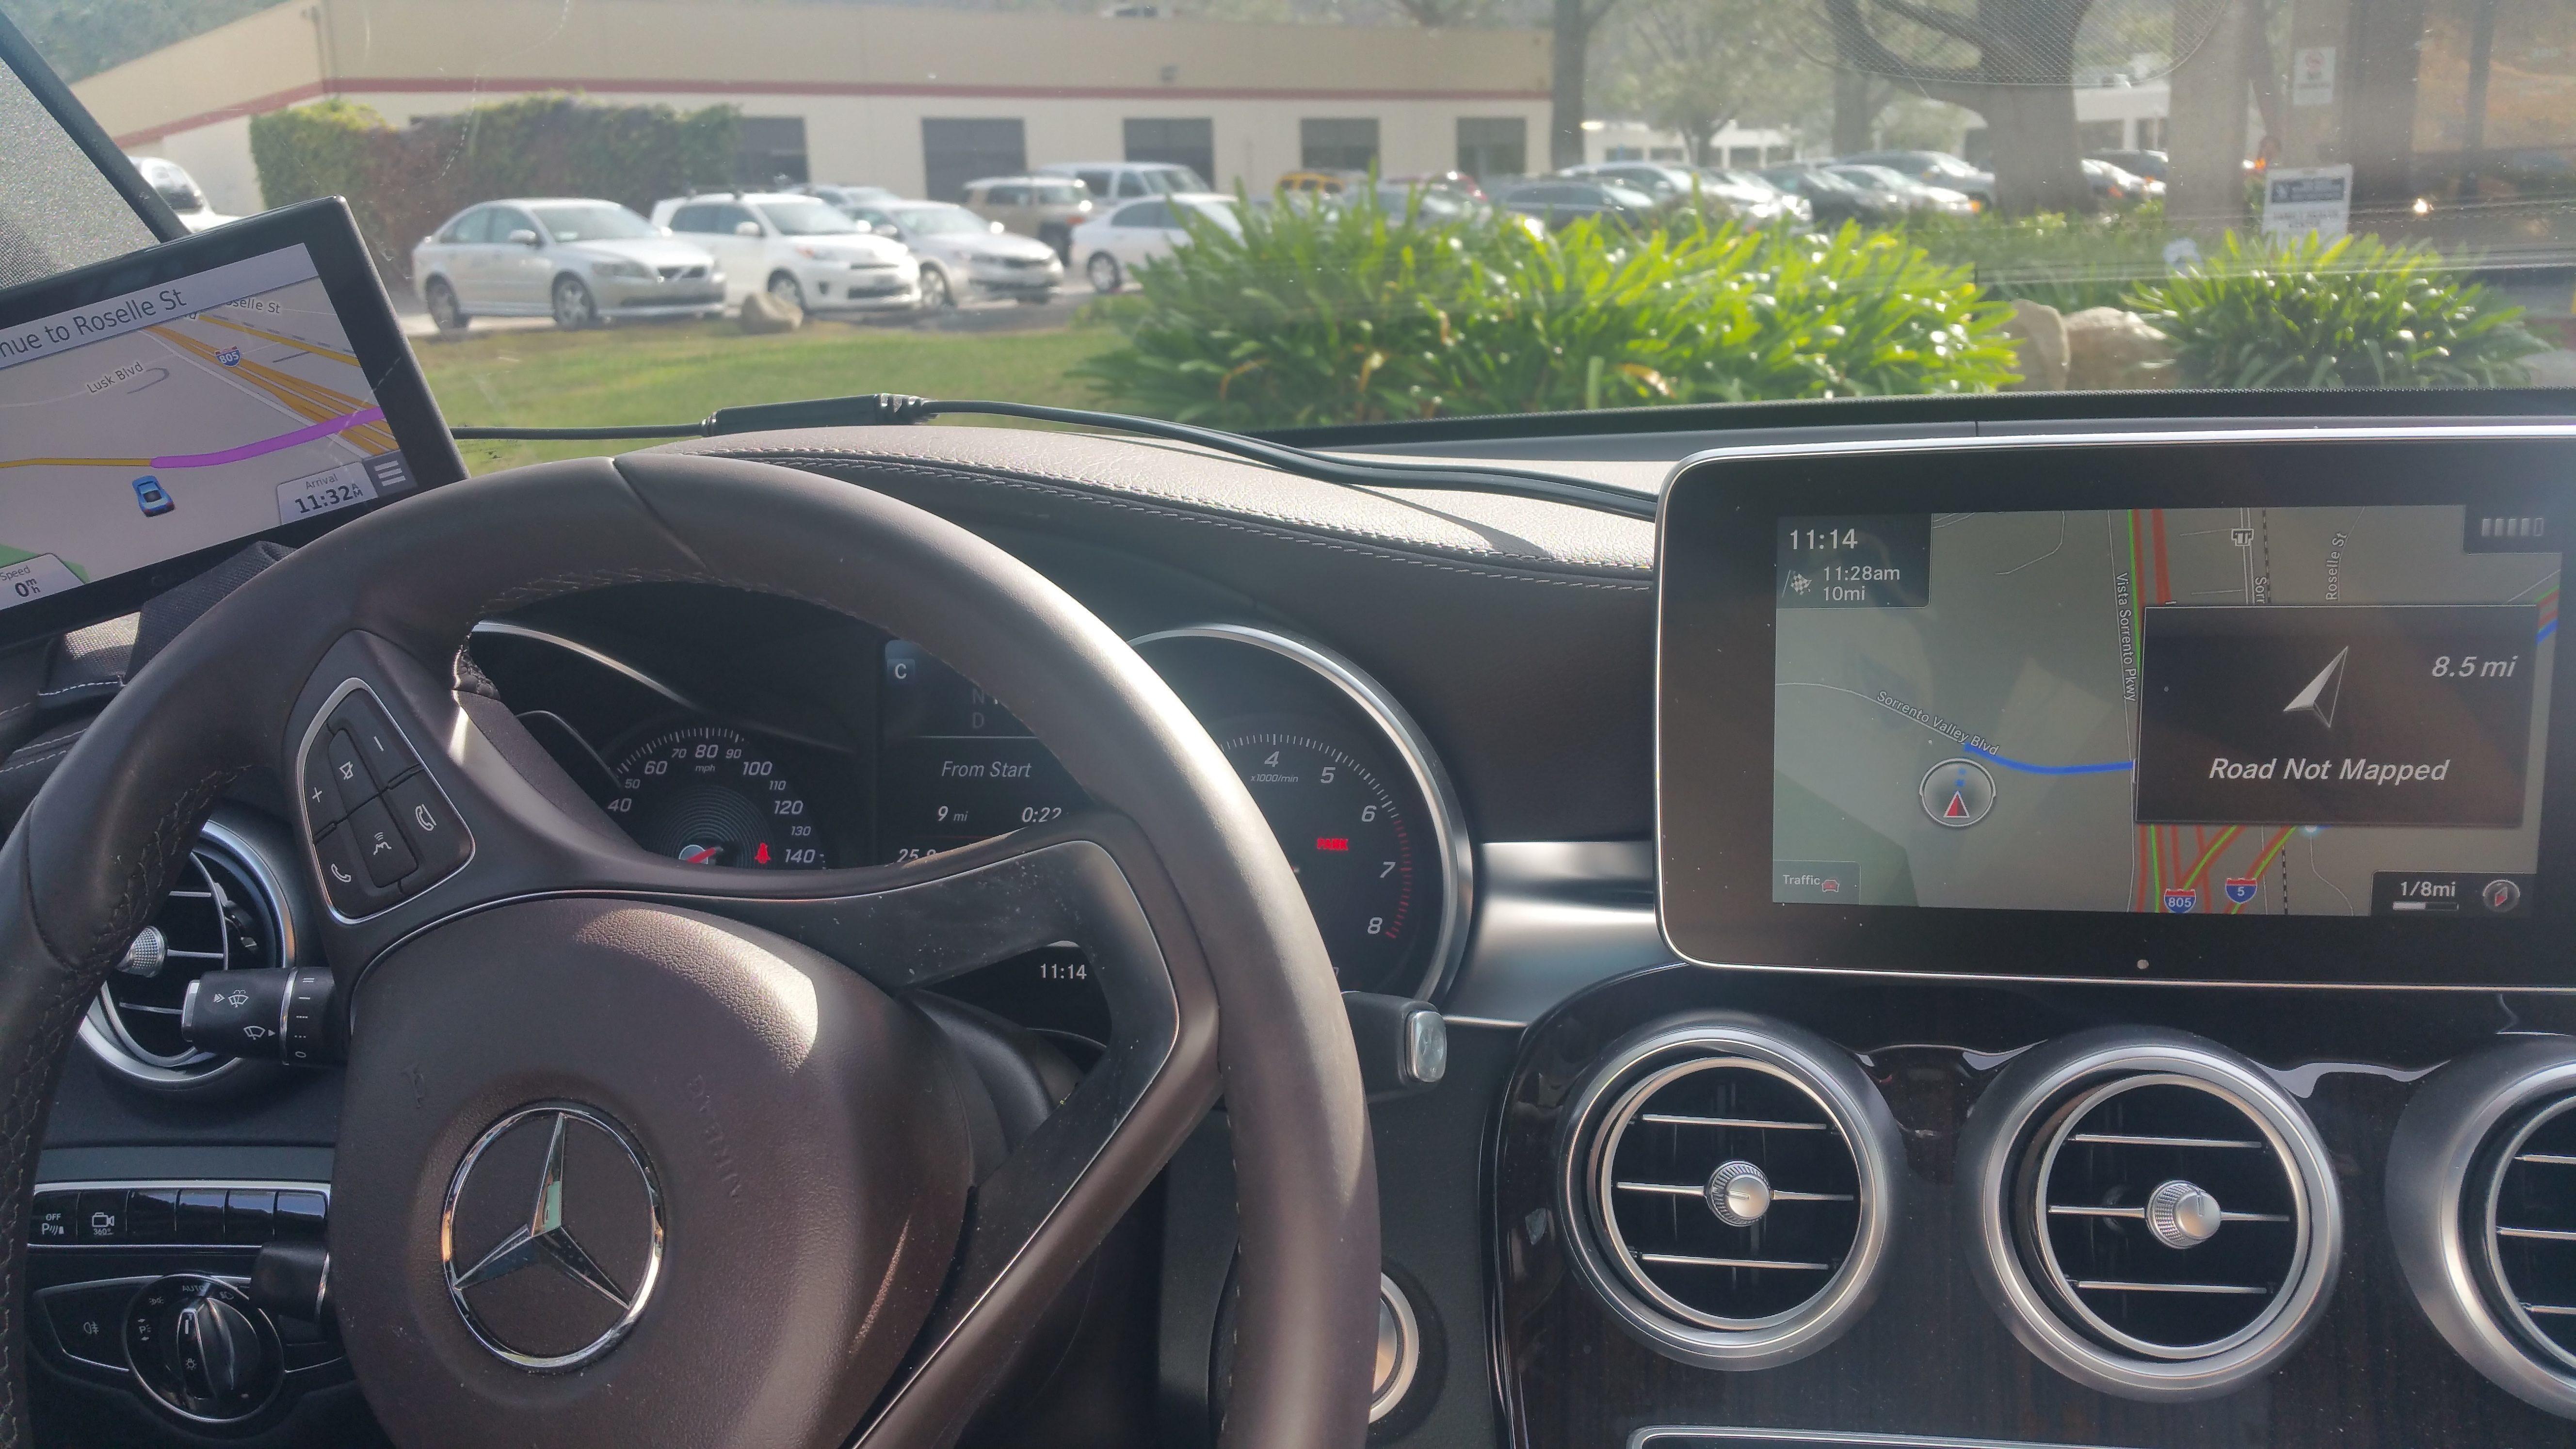 Orlando vintage stereo repair andnot car for Mercedes benz car radio repair